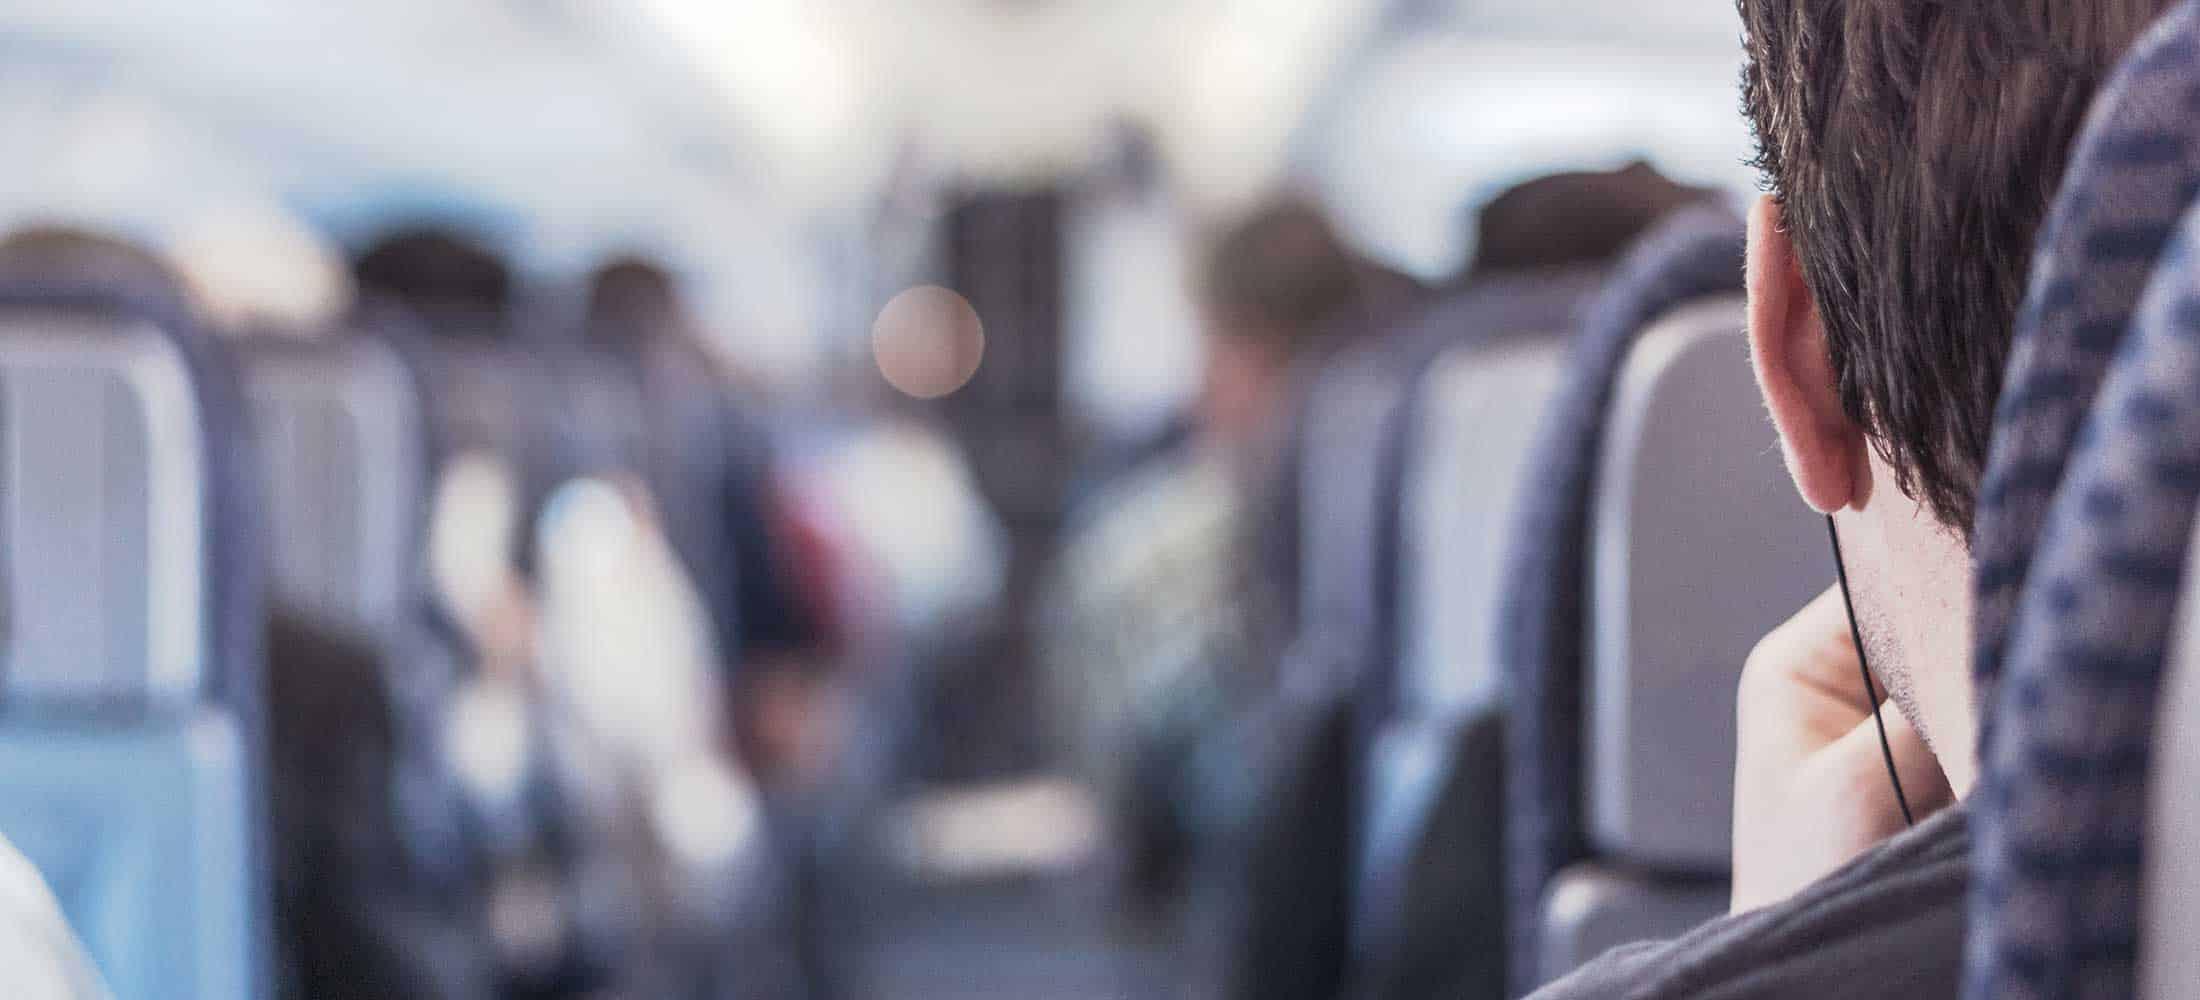 Man on an airplane